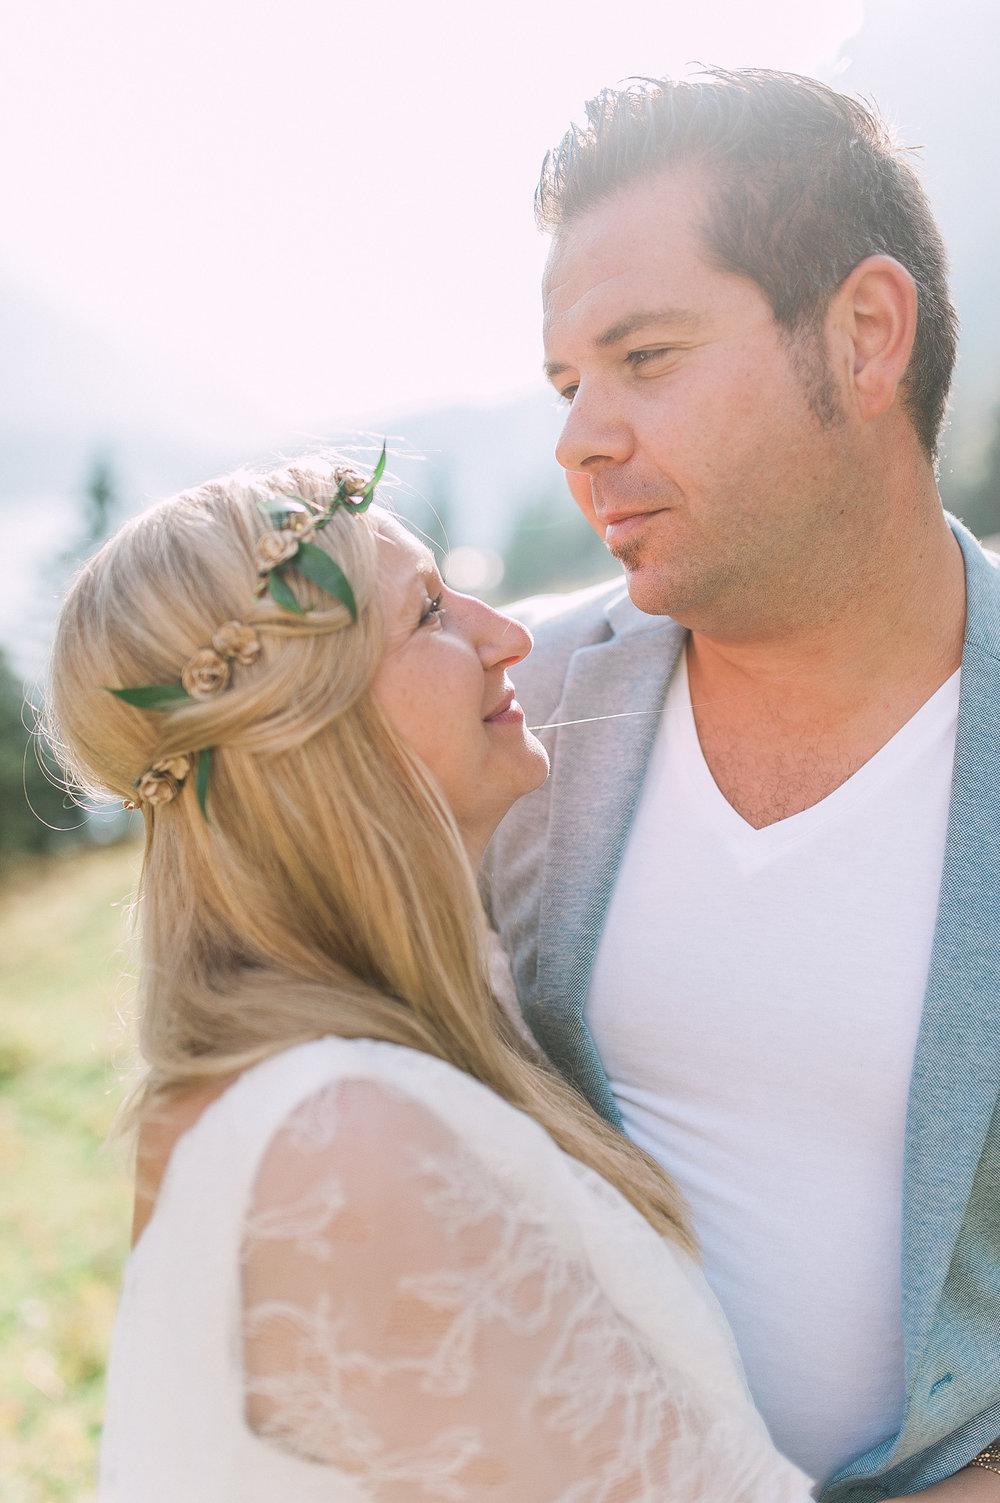 k&m-weddingphotography-10.jpg